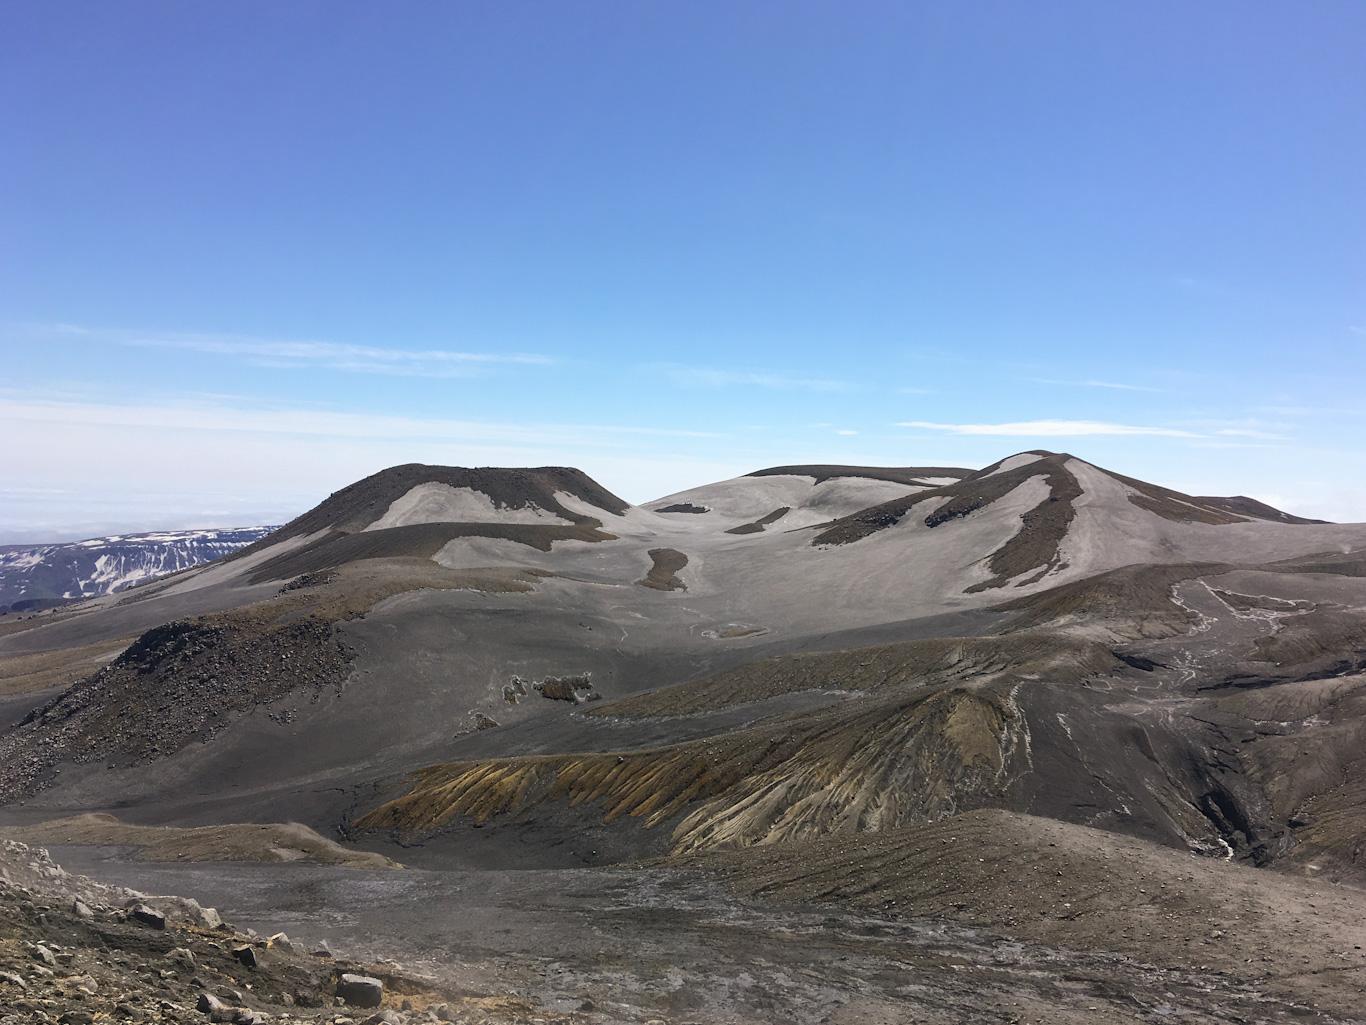 Парамушир, окрестности вулкана Эбеко